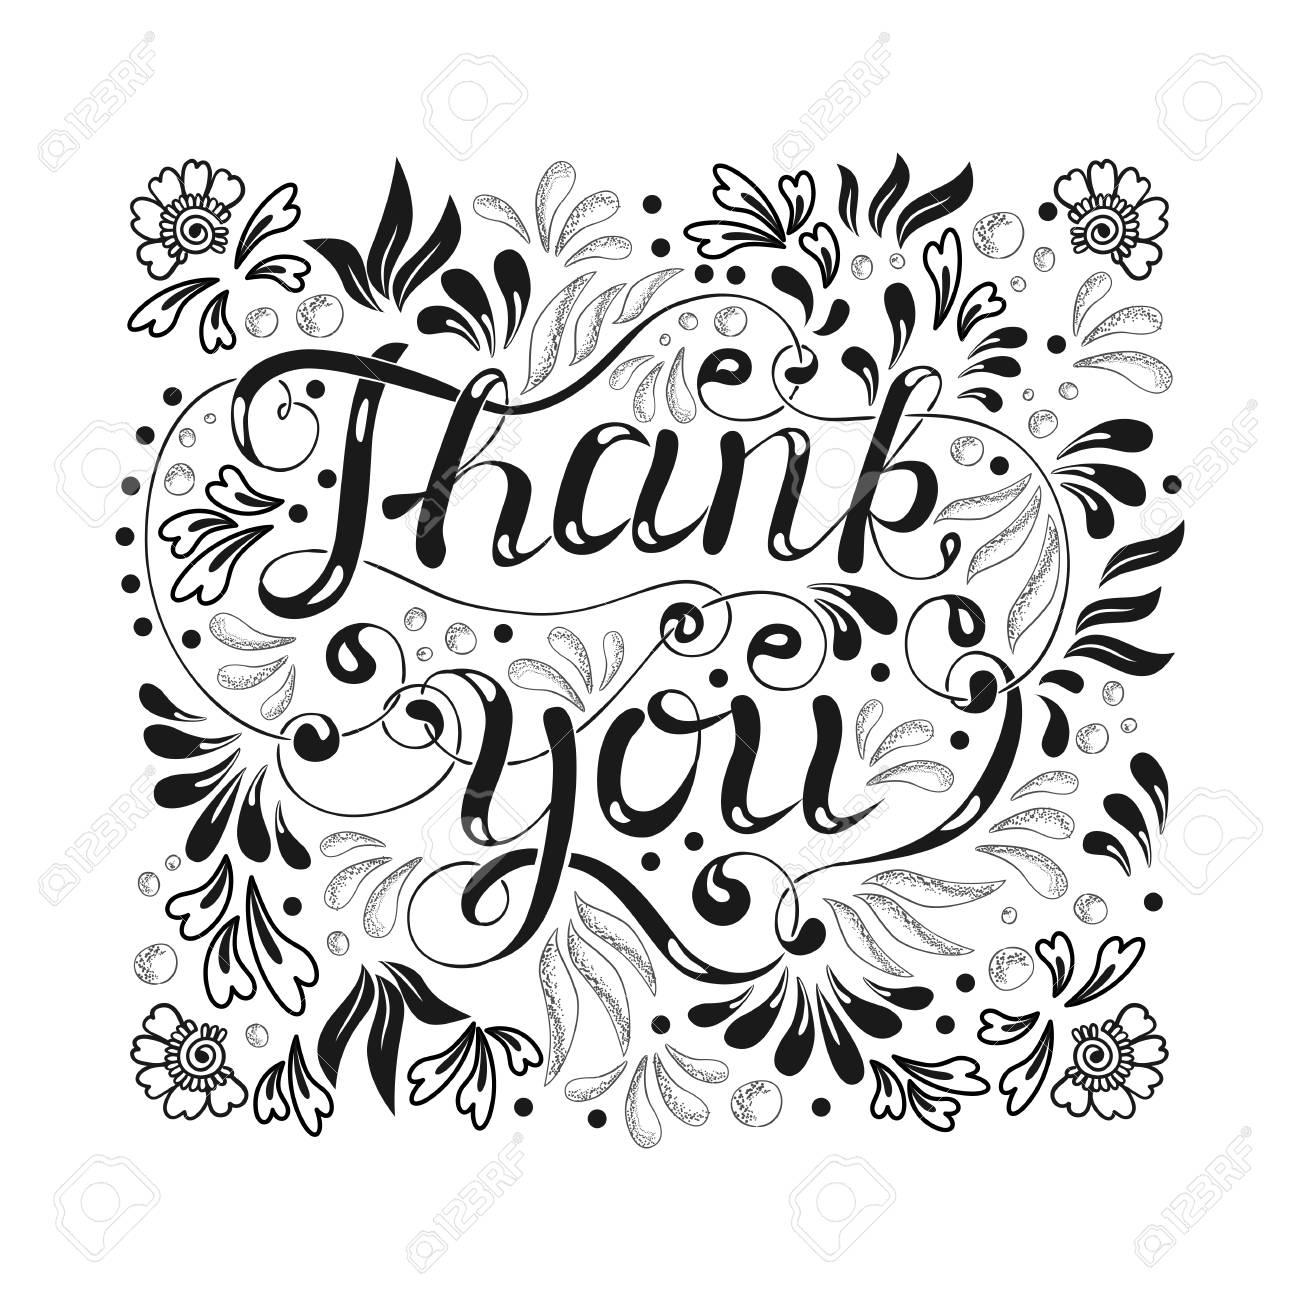 Merci De Lettres A La Main Calligraphie Artisanale Phrase Merci De